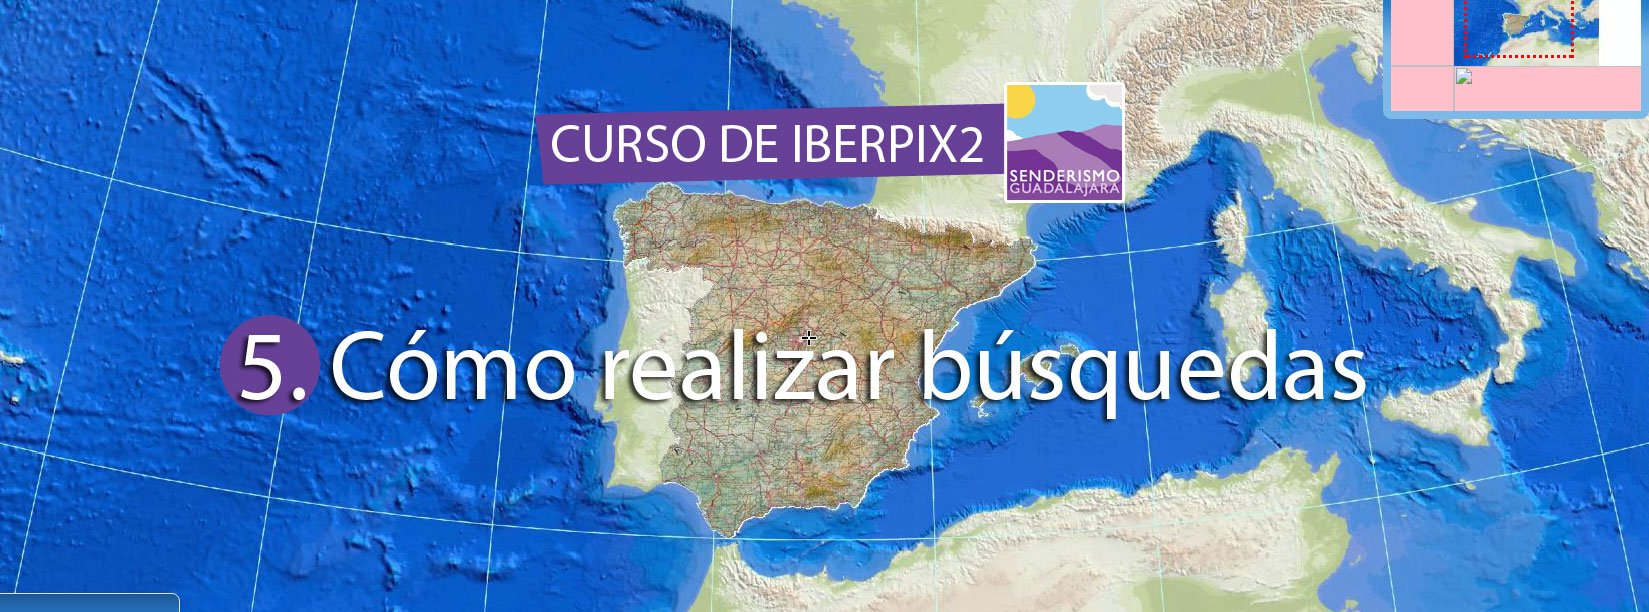 Curso de IBERPIX2 – Cap.05 Cómo realizar búsquedas en IBERPIX